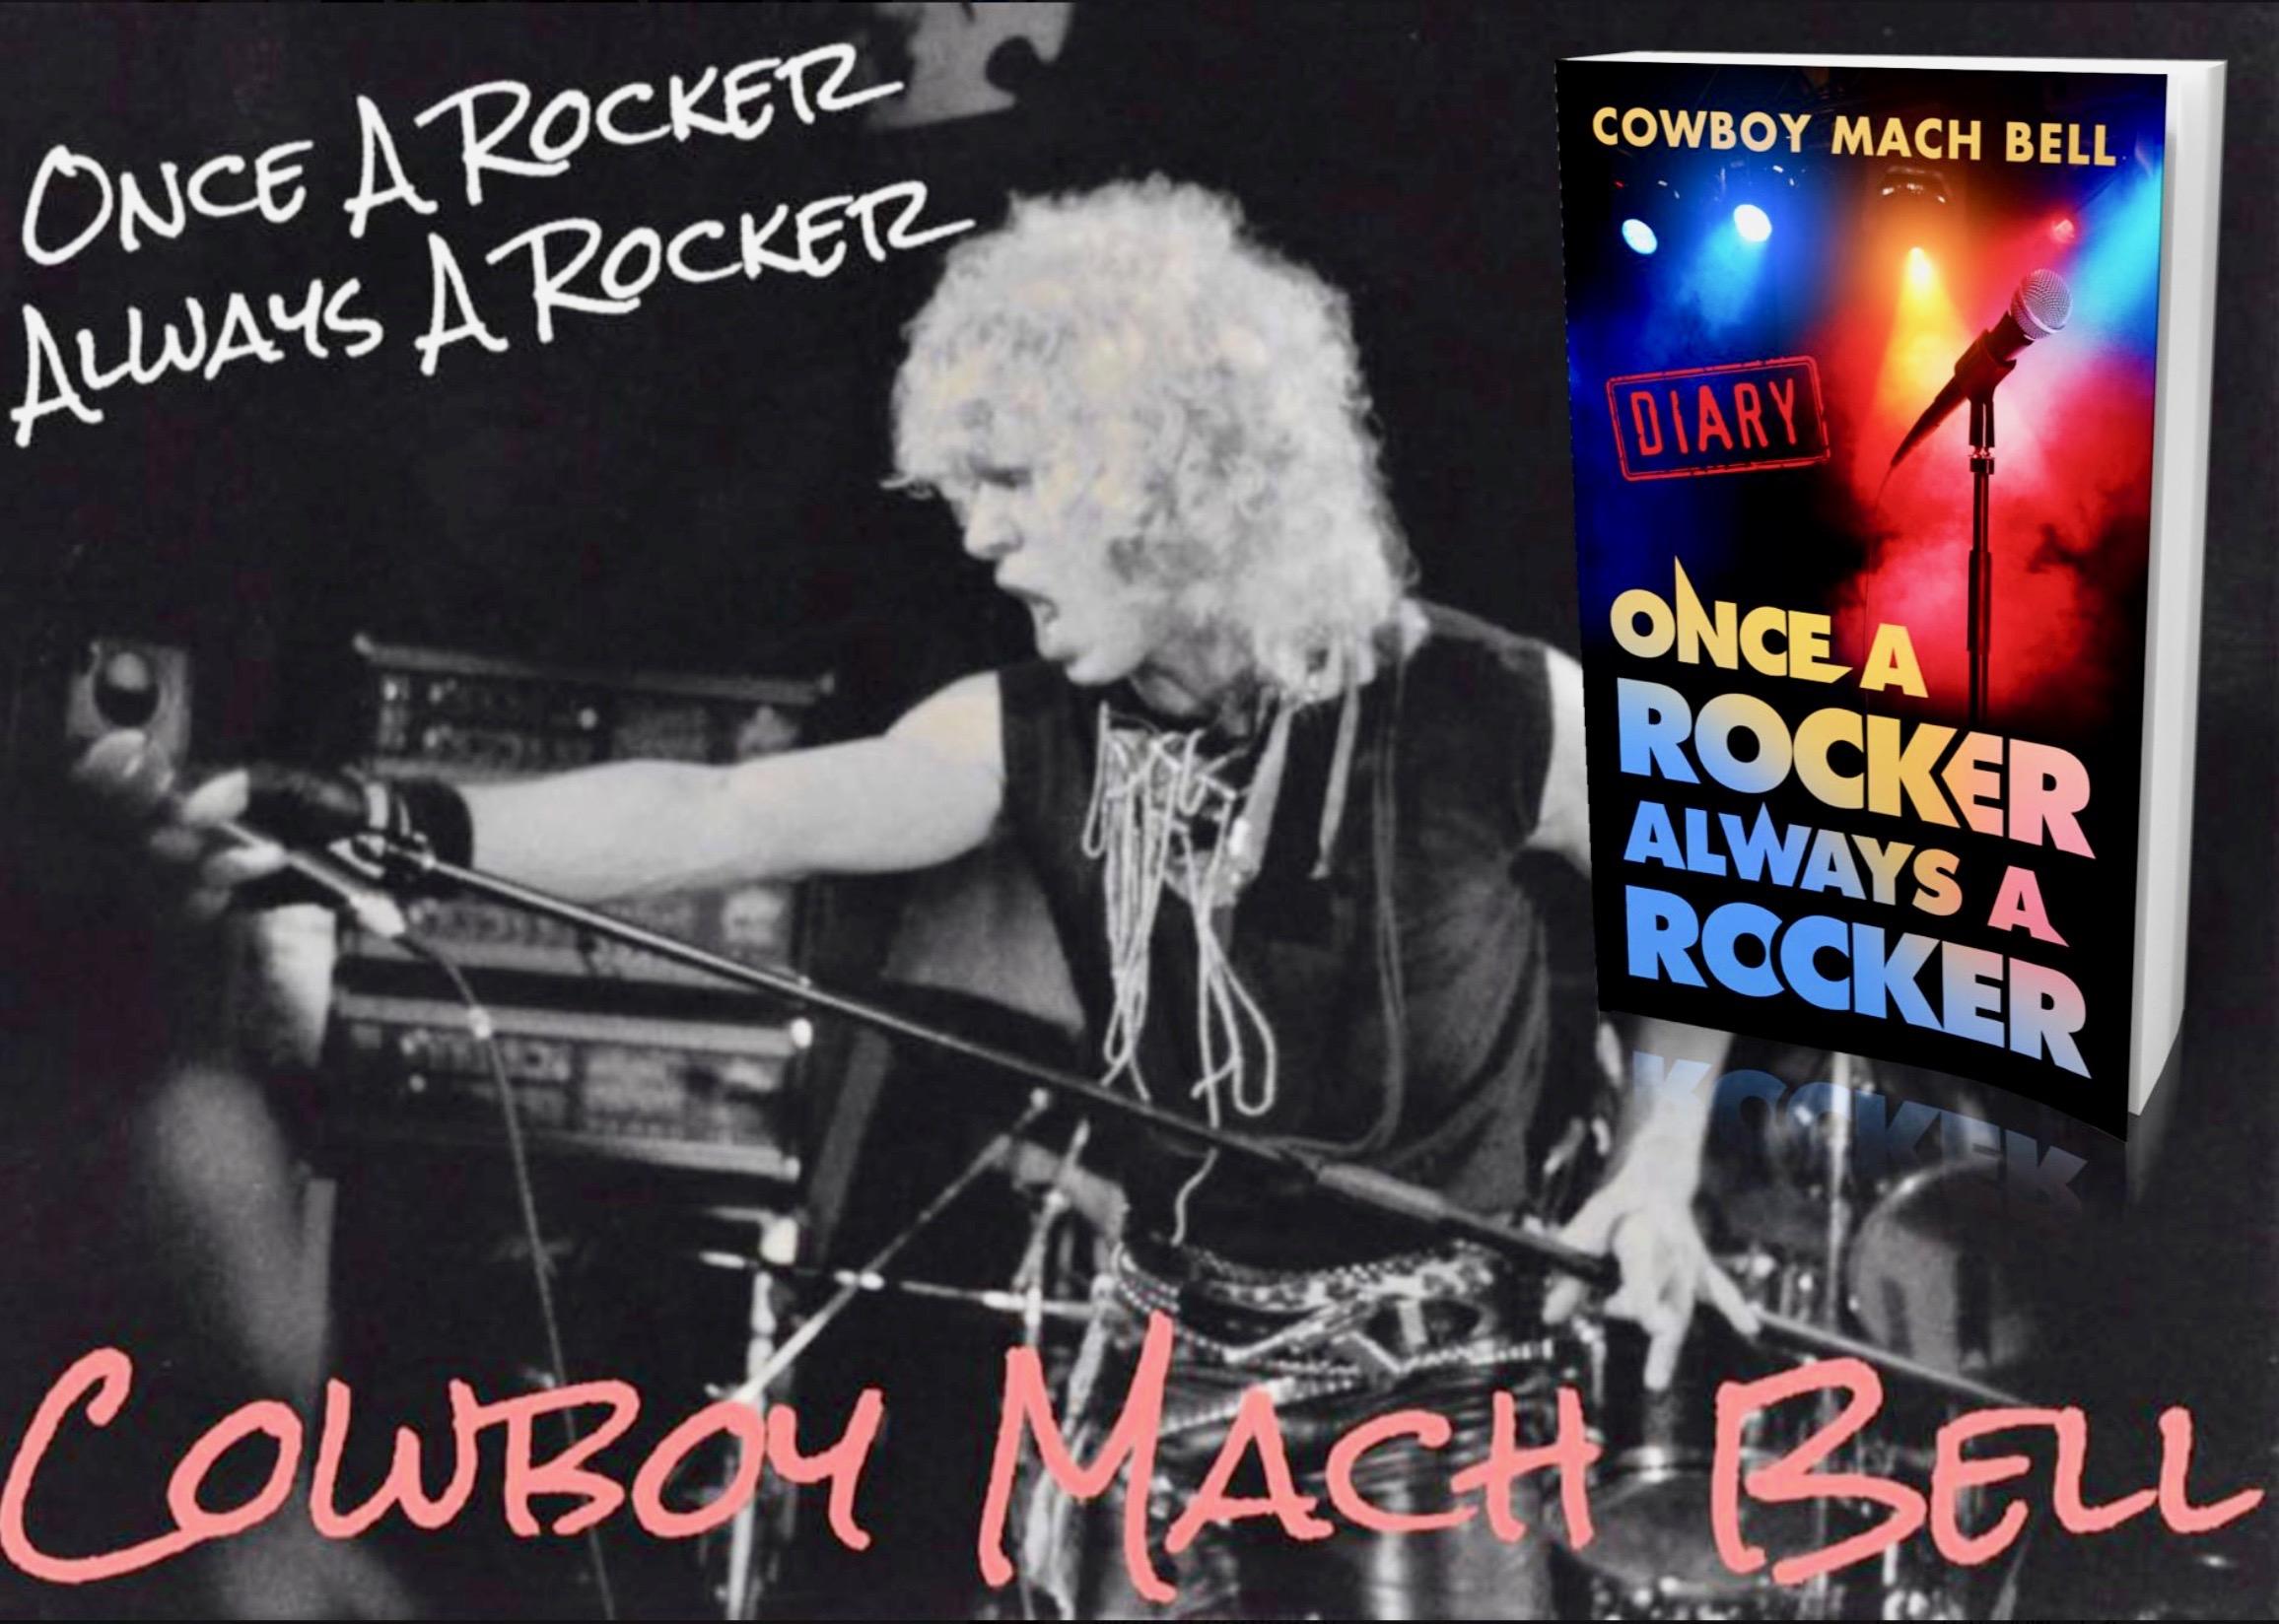 Cowboy MACH BELL